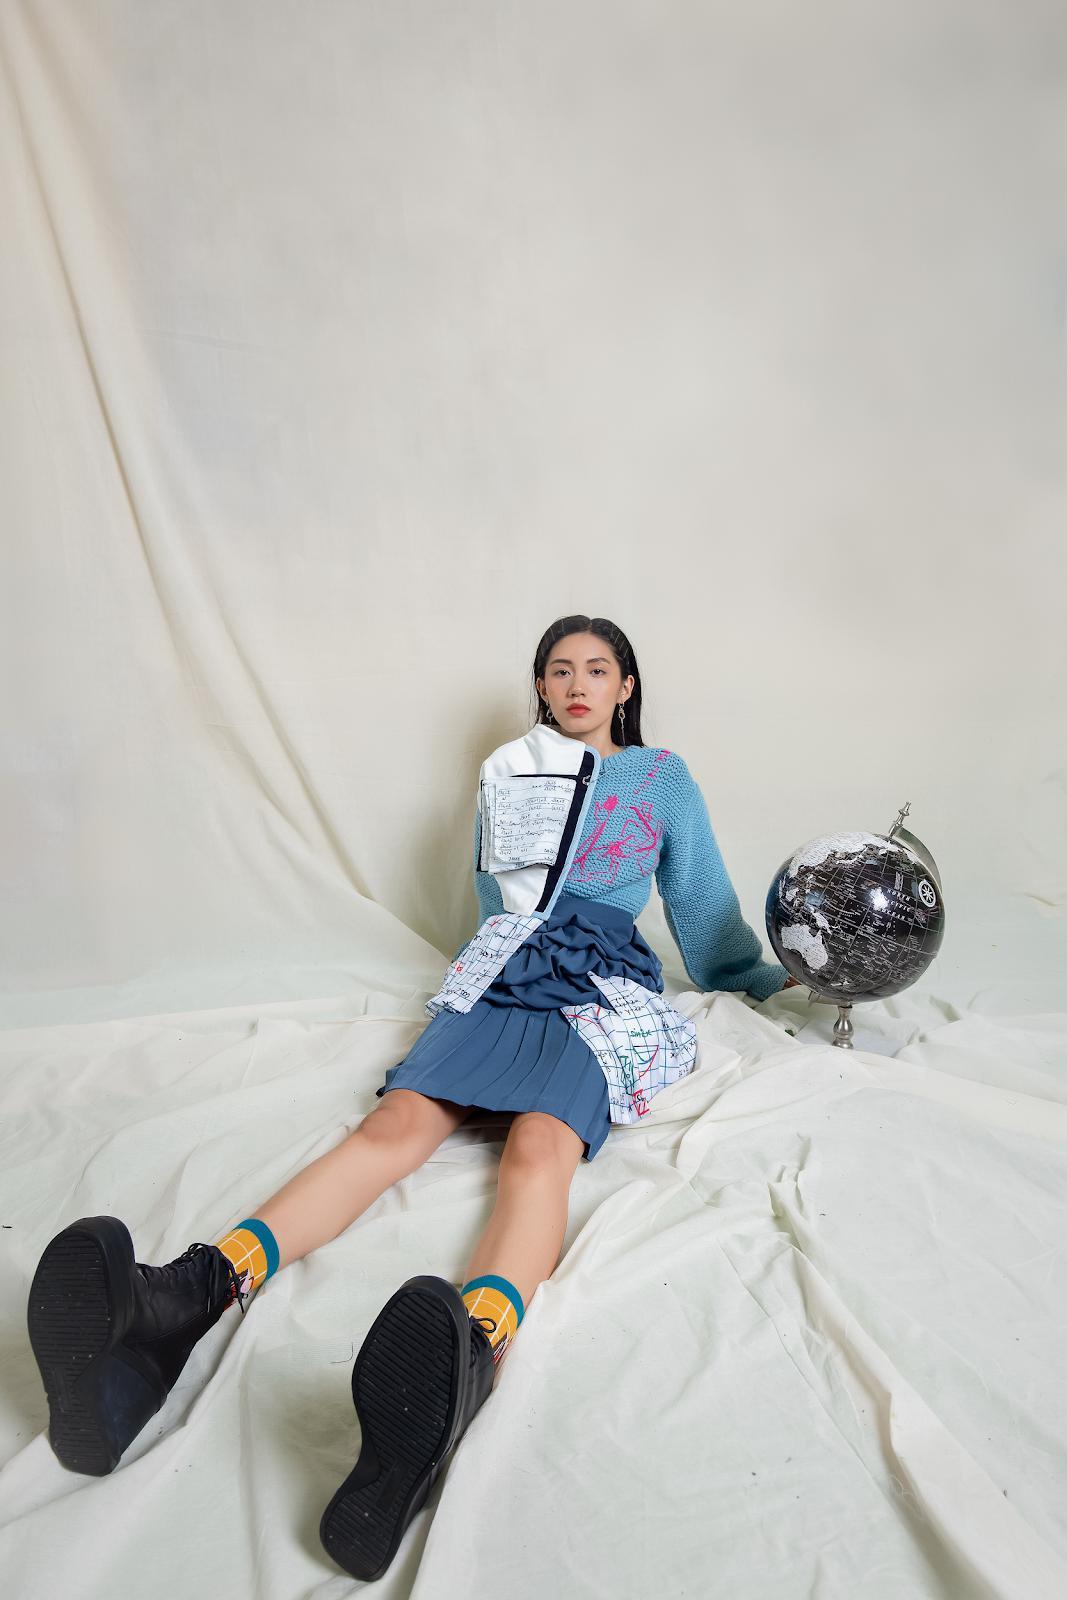 fashion creation 2020 BST Stu-Dying Phan Thị Thanh Thảo